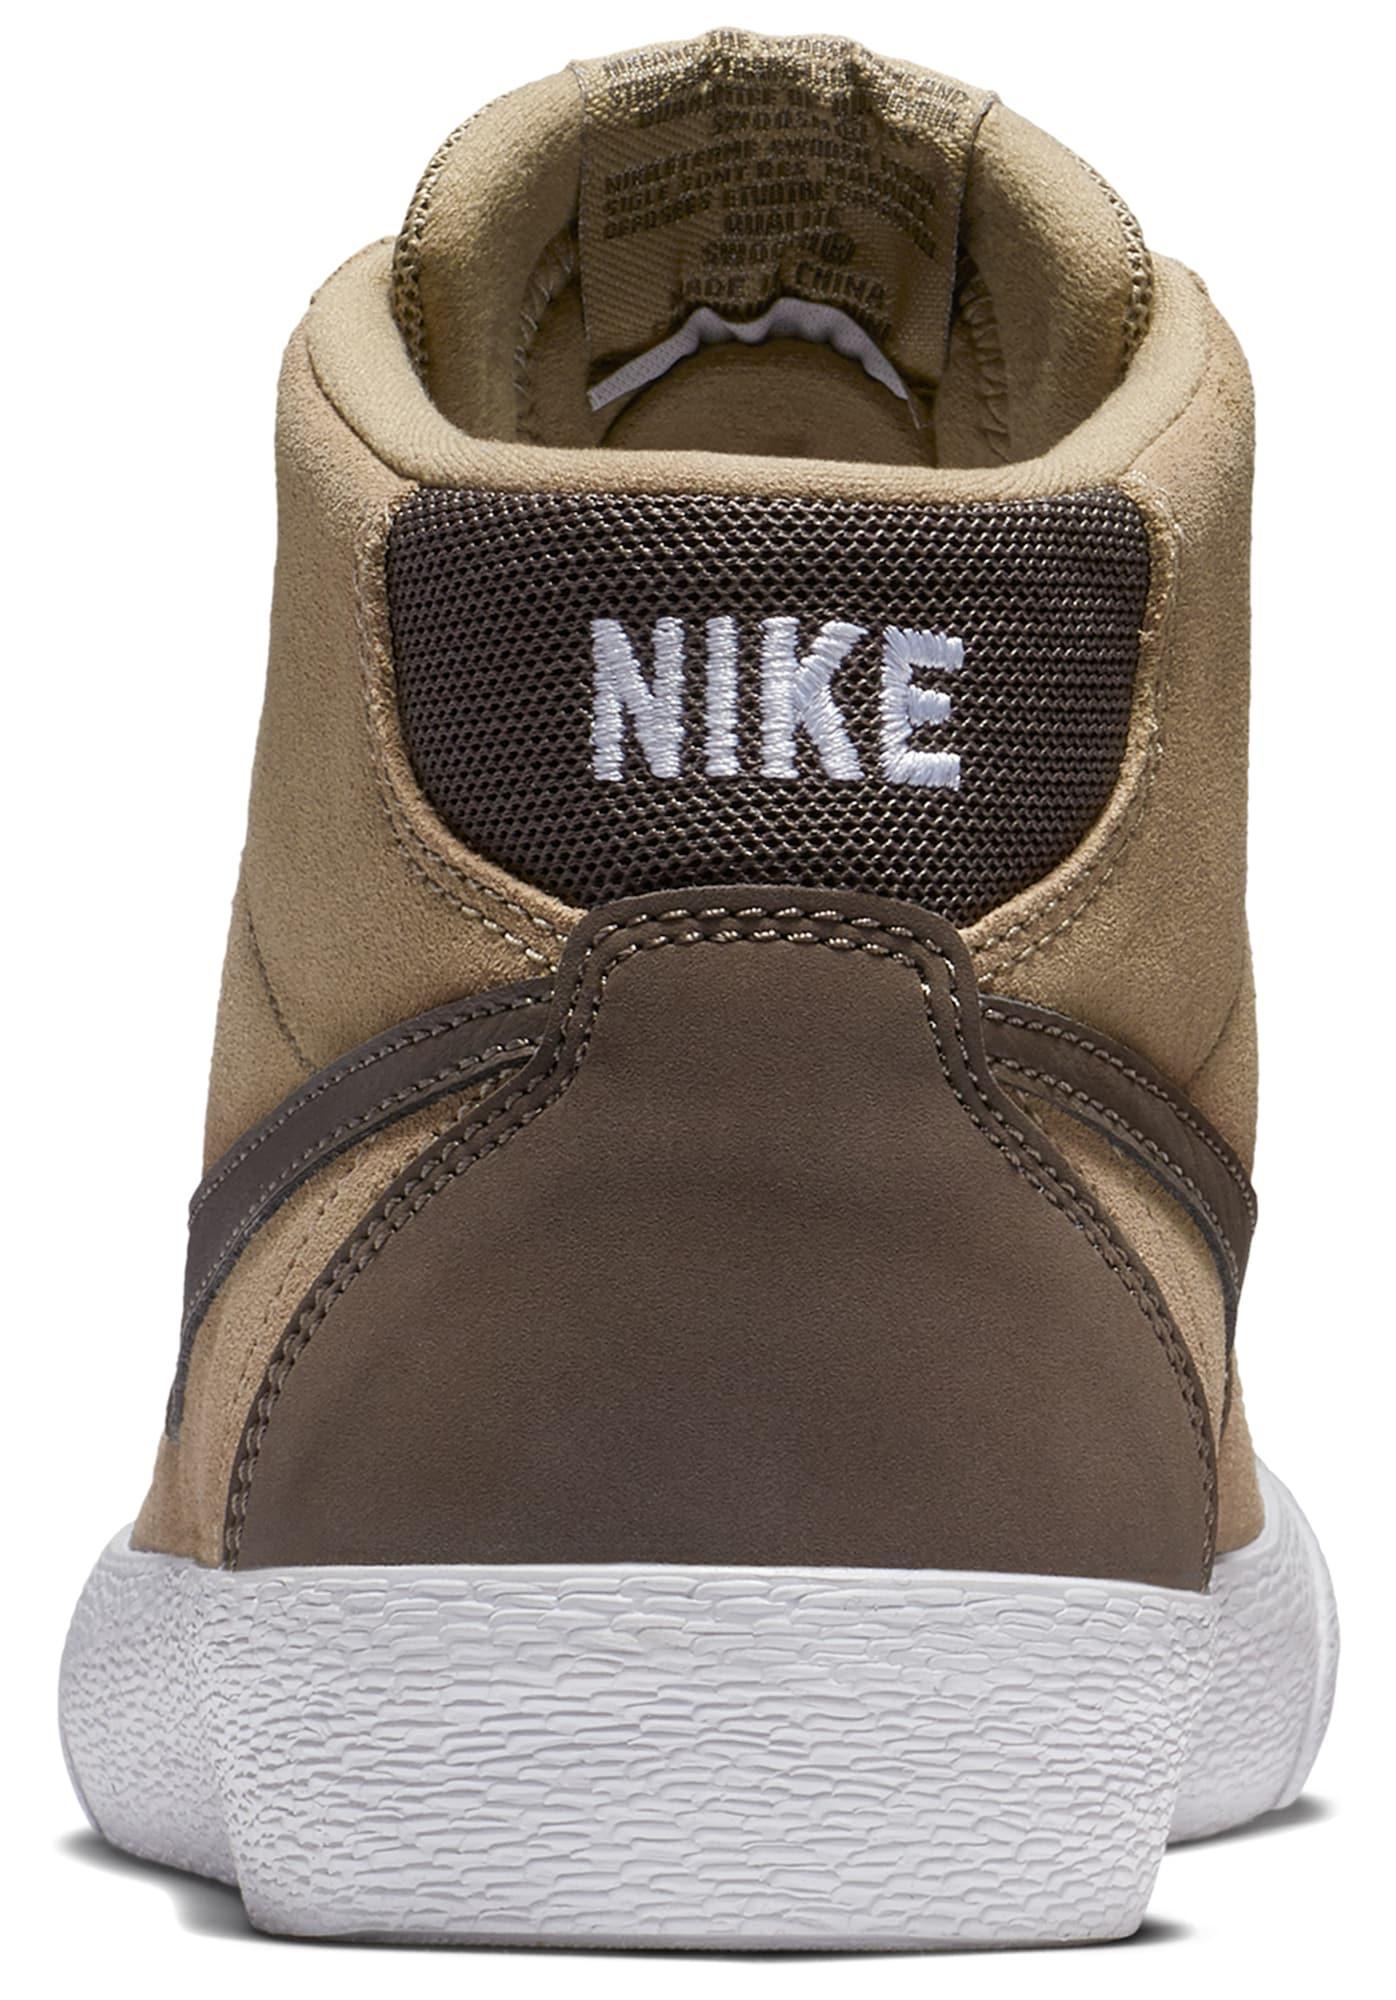 Nike SB, Damen Sneakers hoog Bruin Hi, donkerbeige / bruin